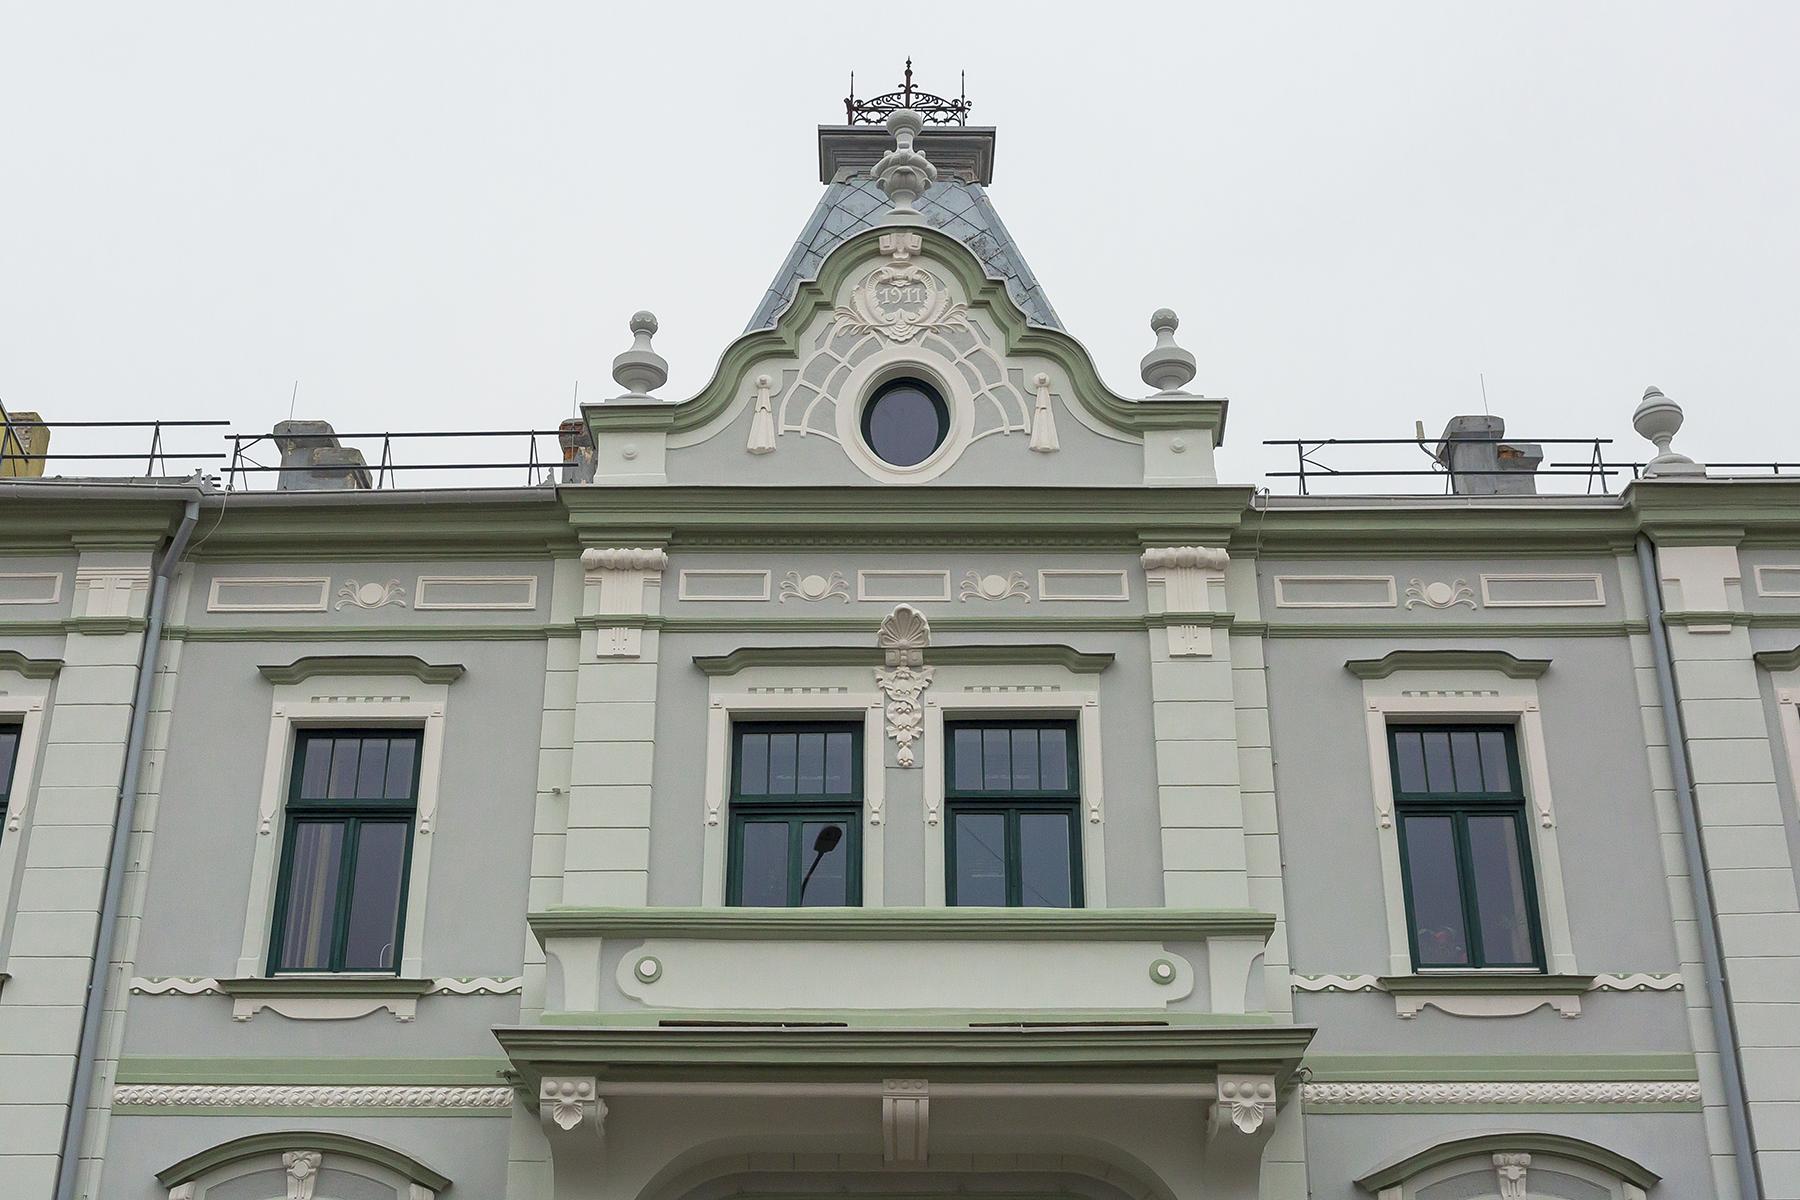 Kurzemes apgabaltiesas nams 012